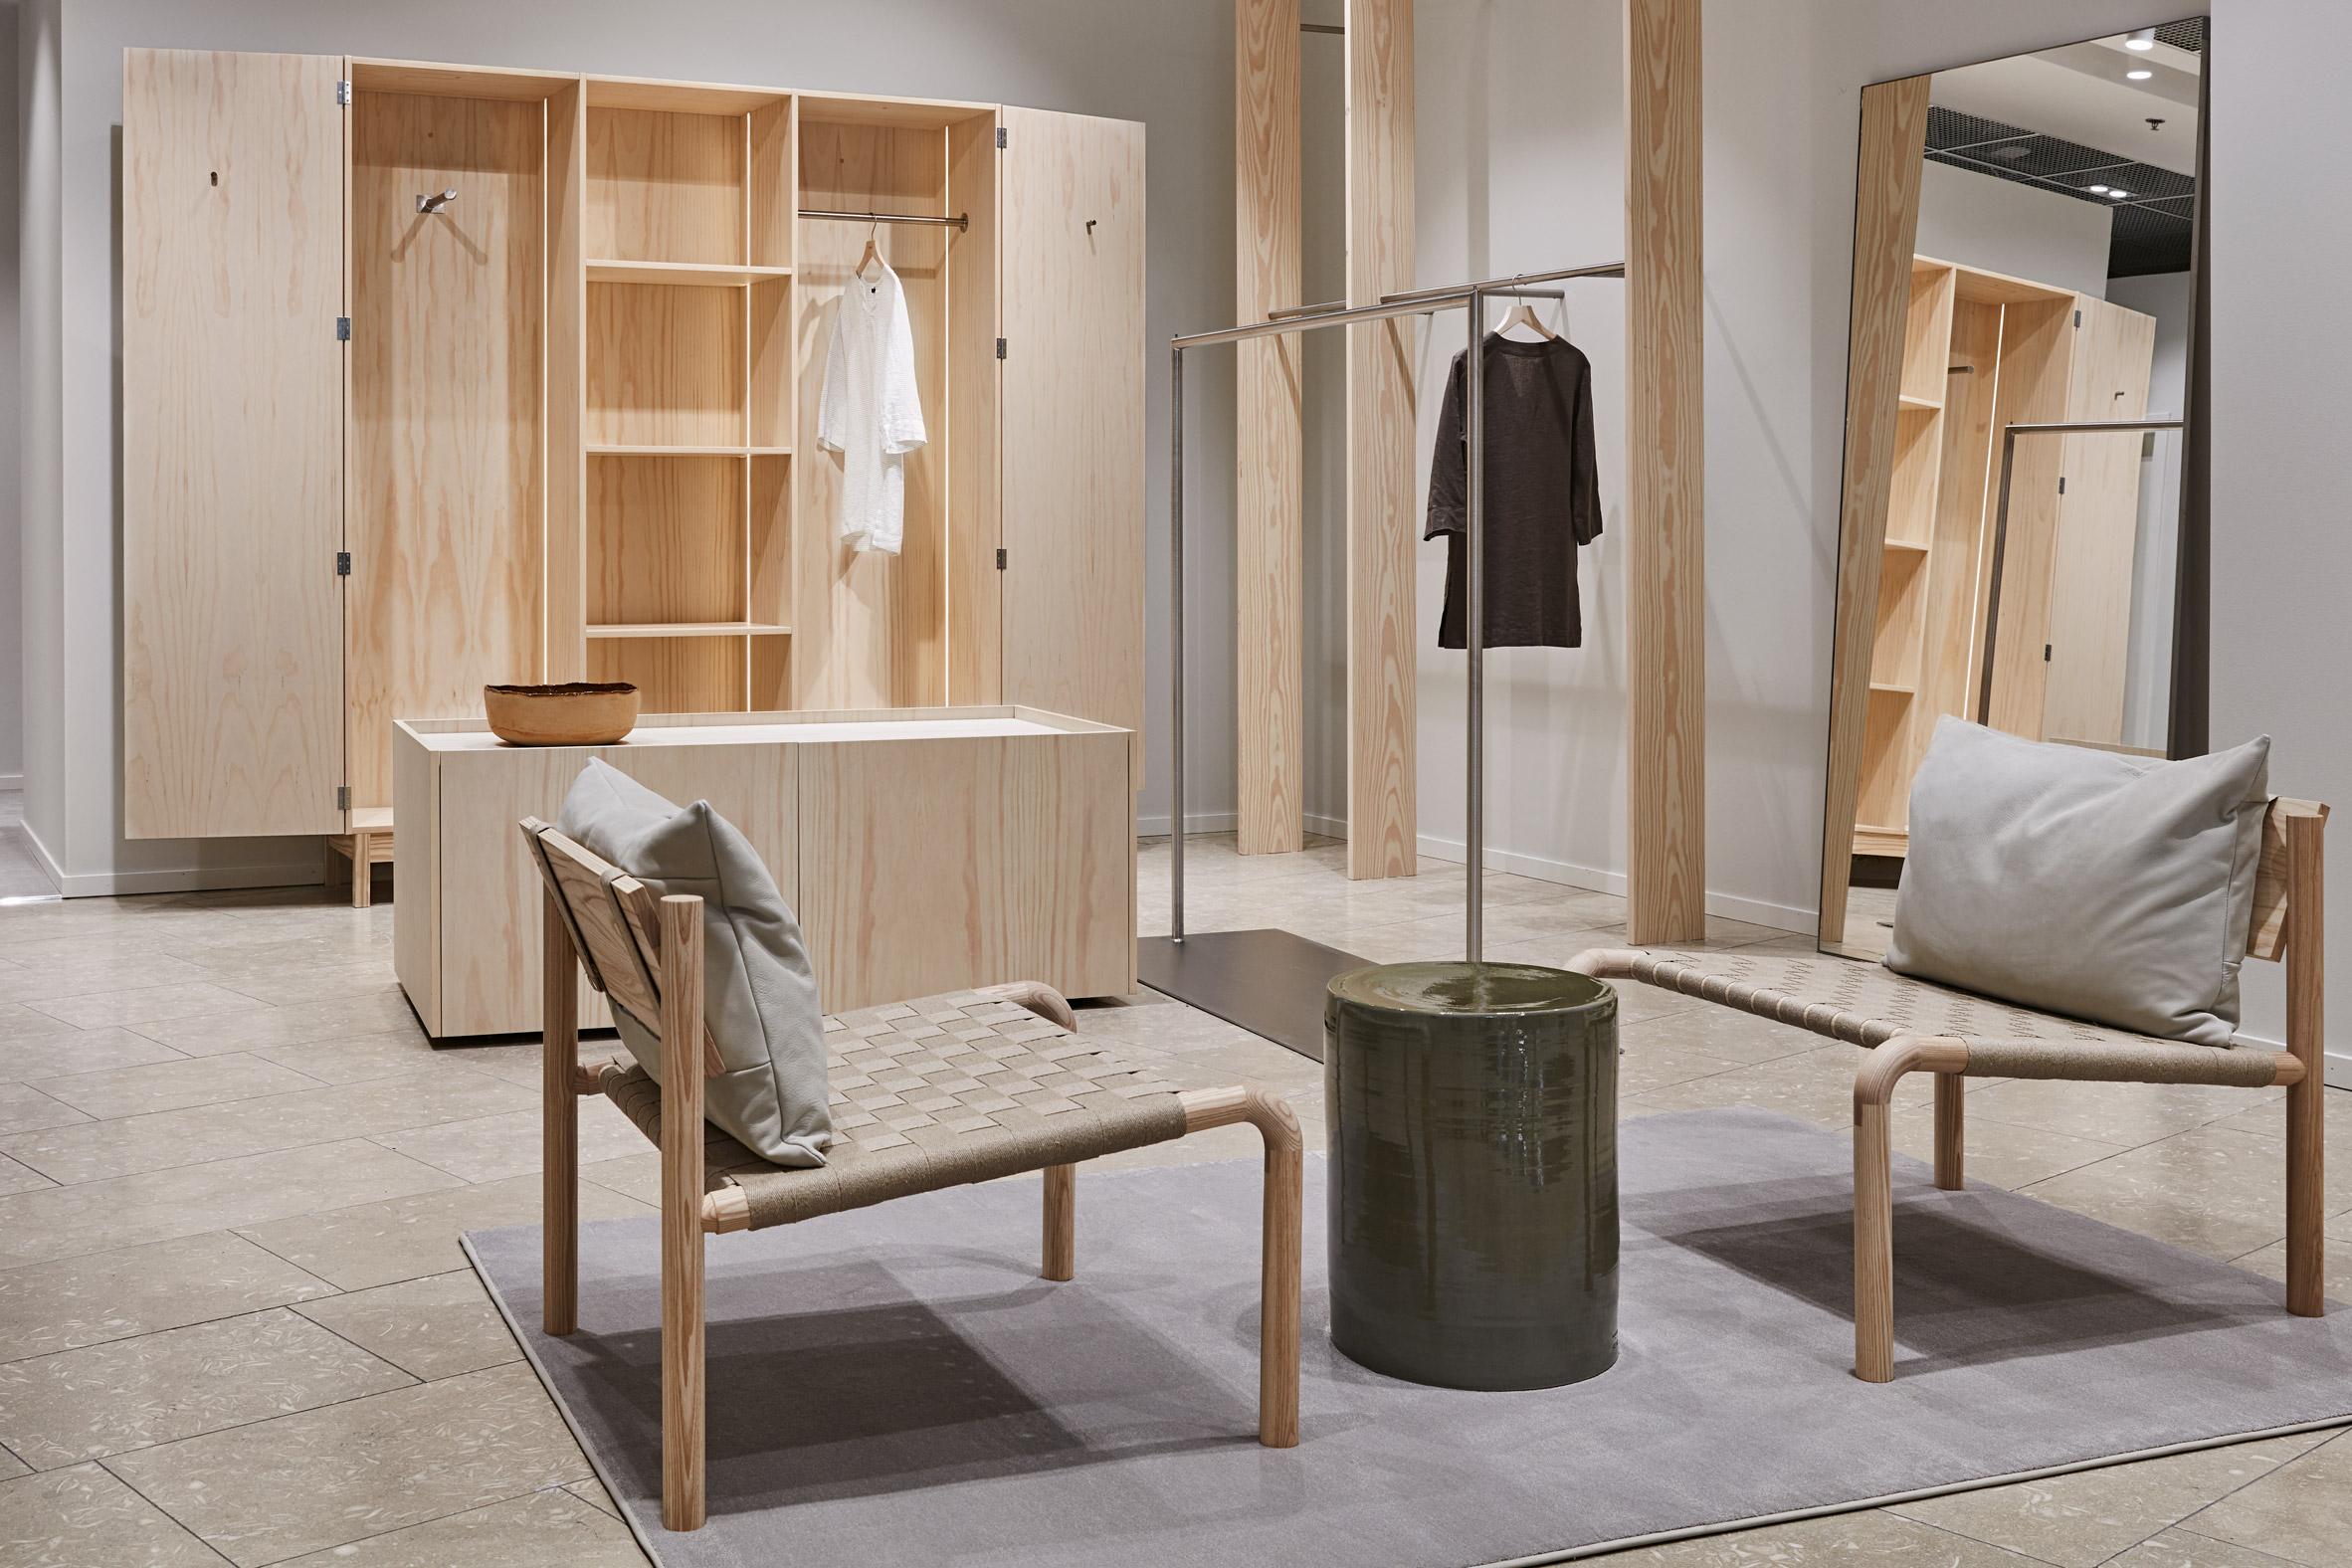 Nanso store by Studio Joanna Laajisto